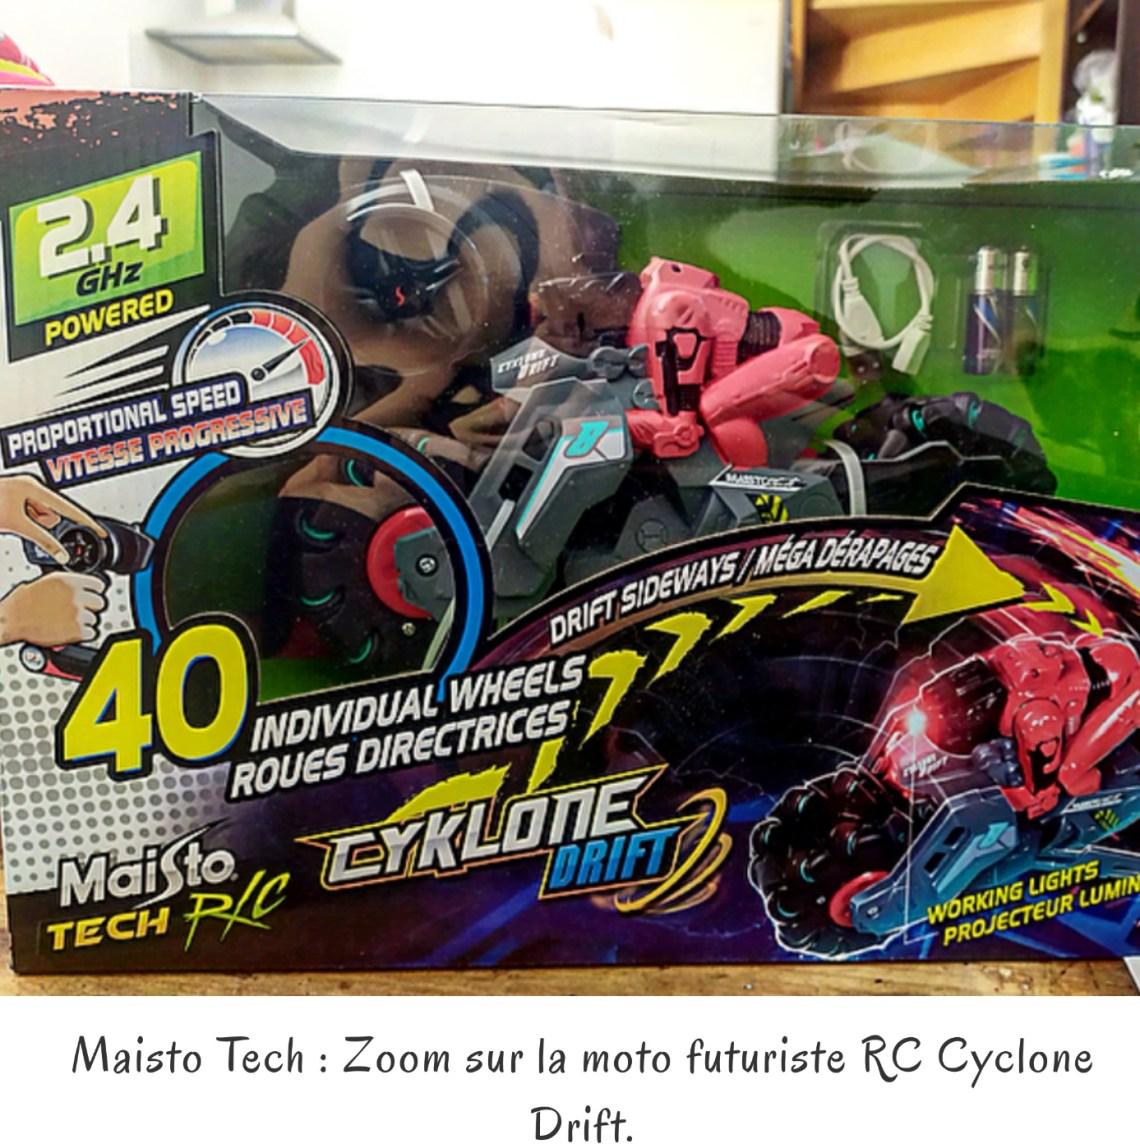 Maisto Tech : Zoom sur la moto futuriste RC Cyclone Drift.